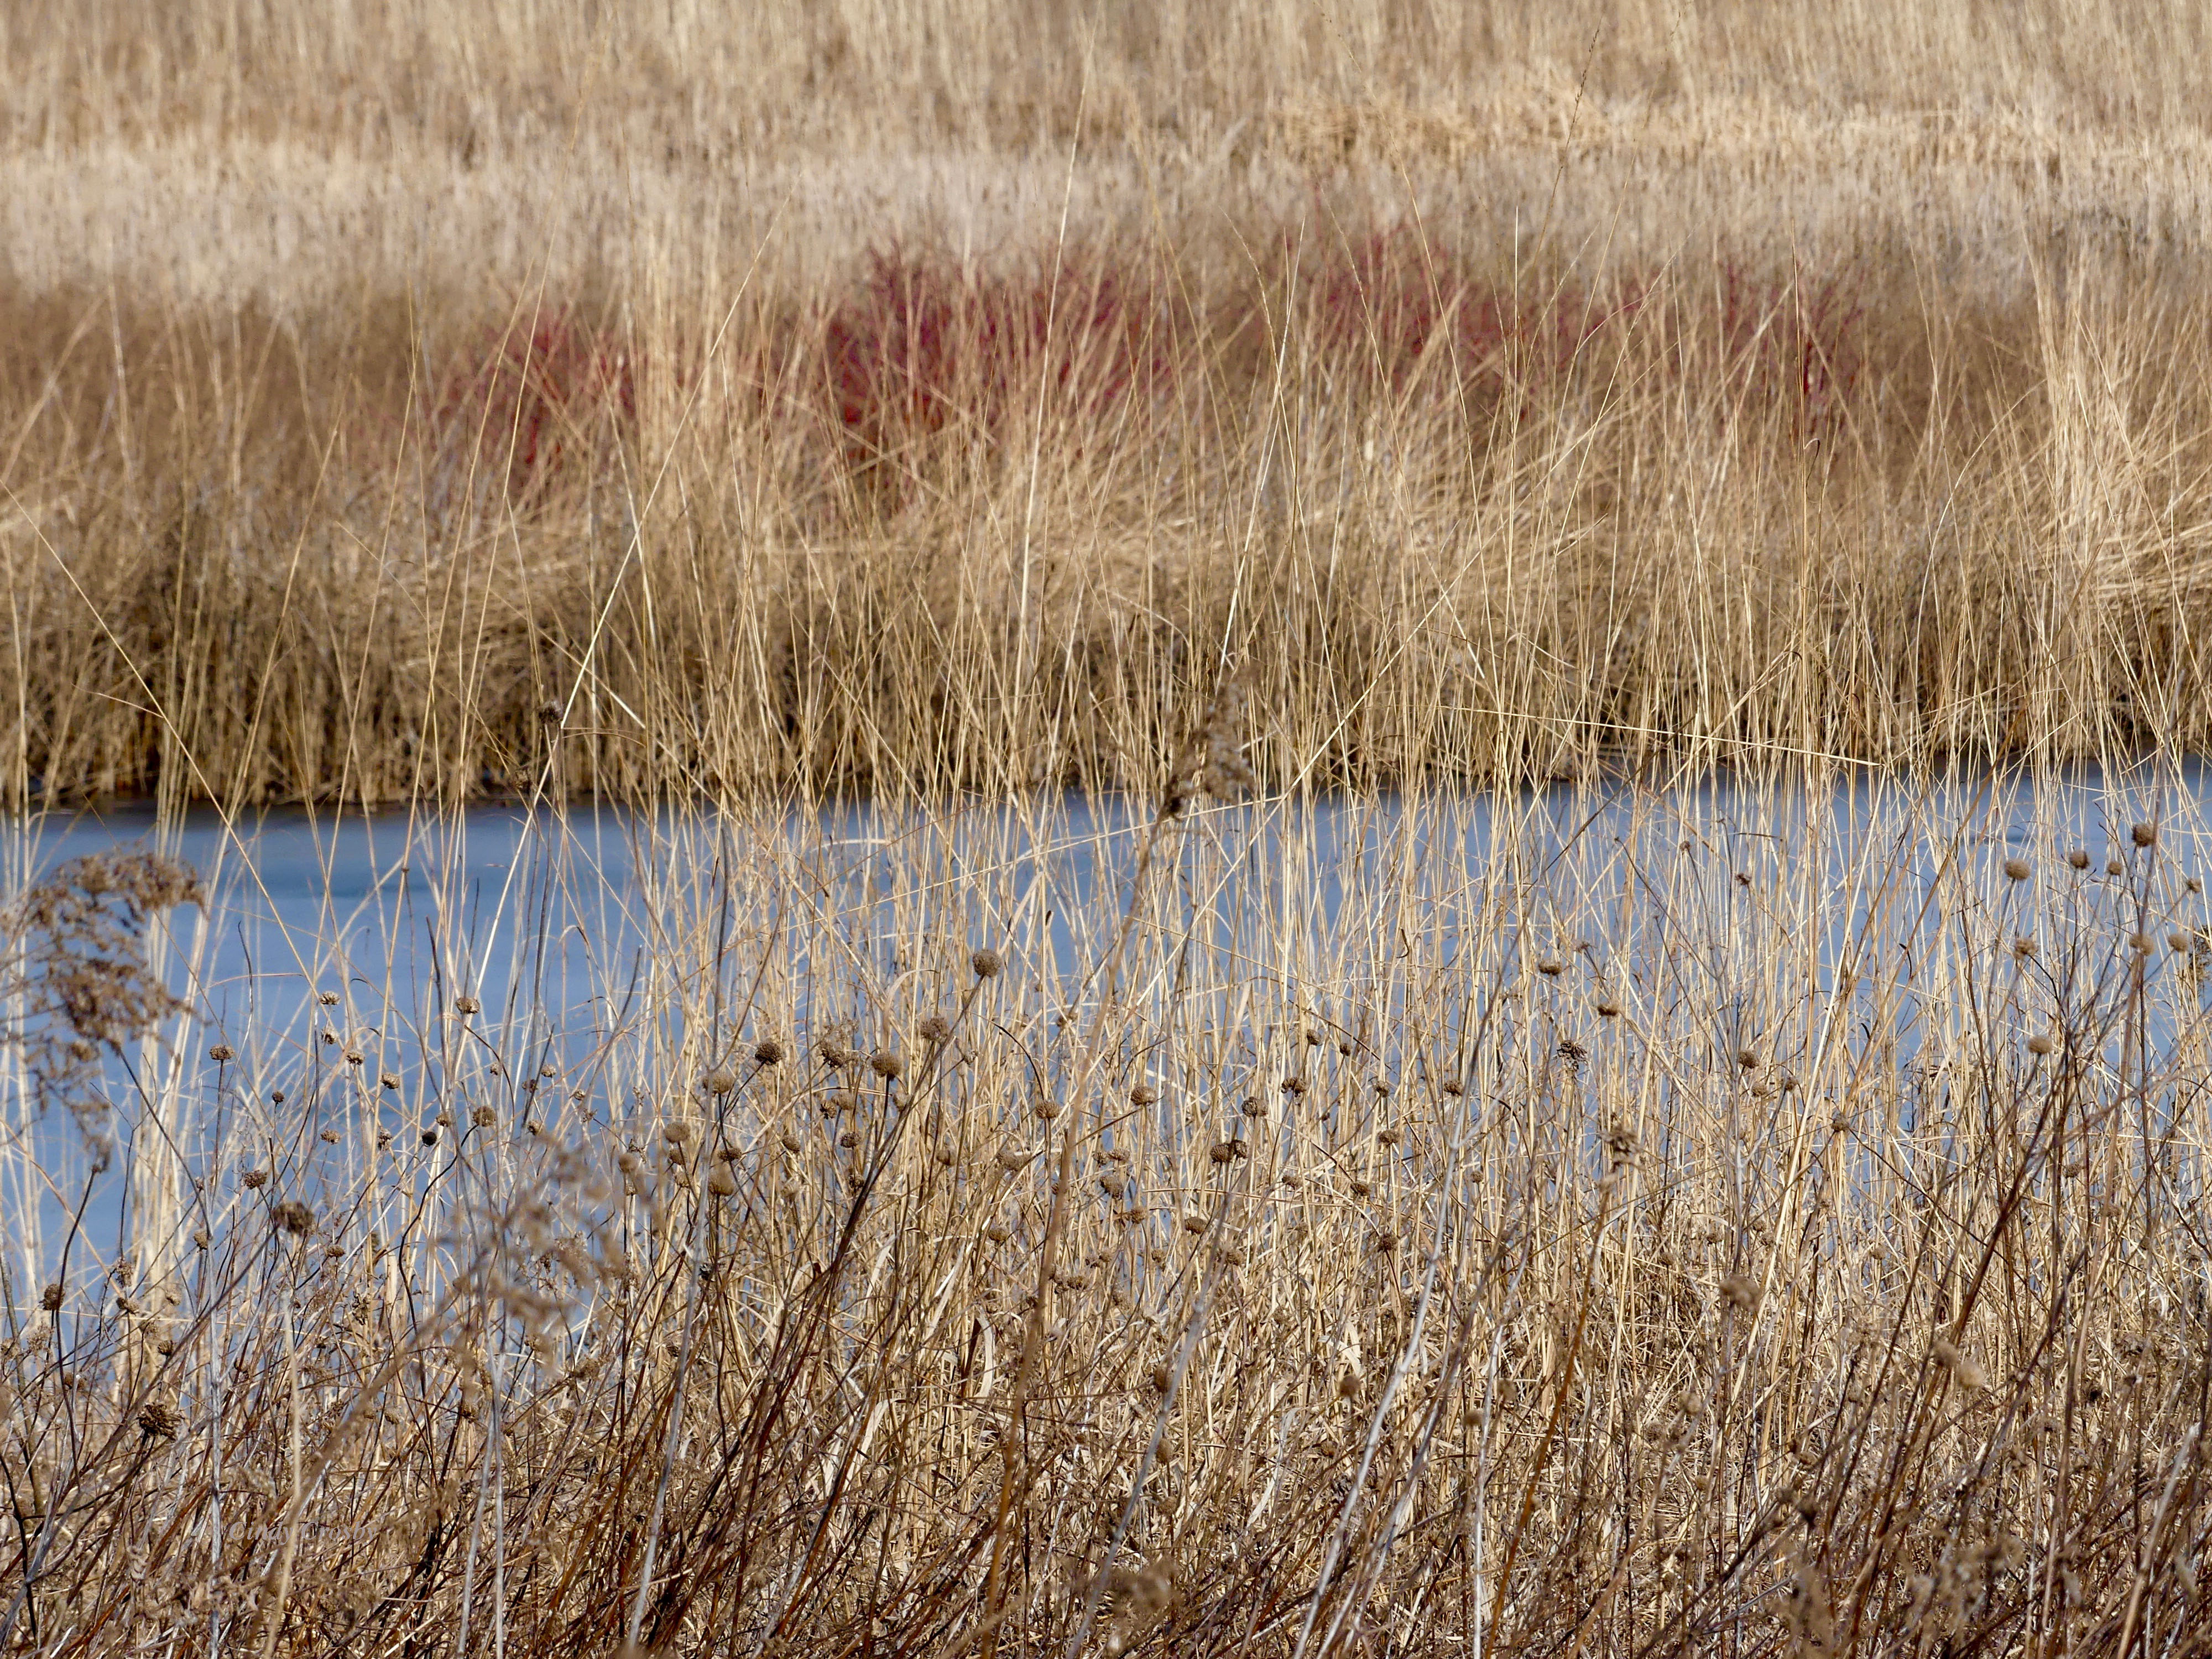 grassesandwaterspringbrookprairie3120WM.jpg